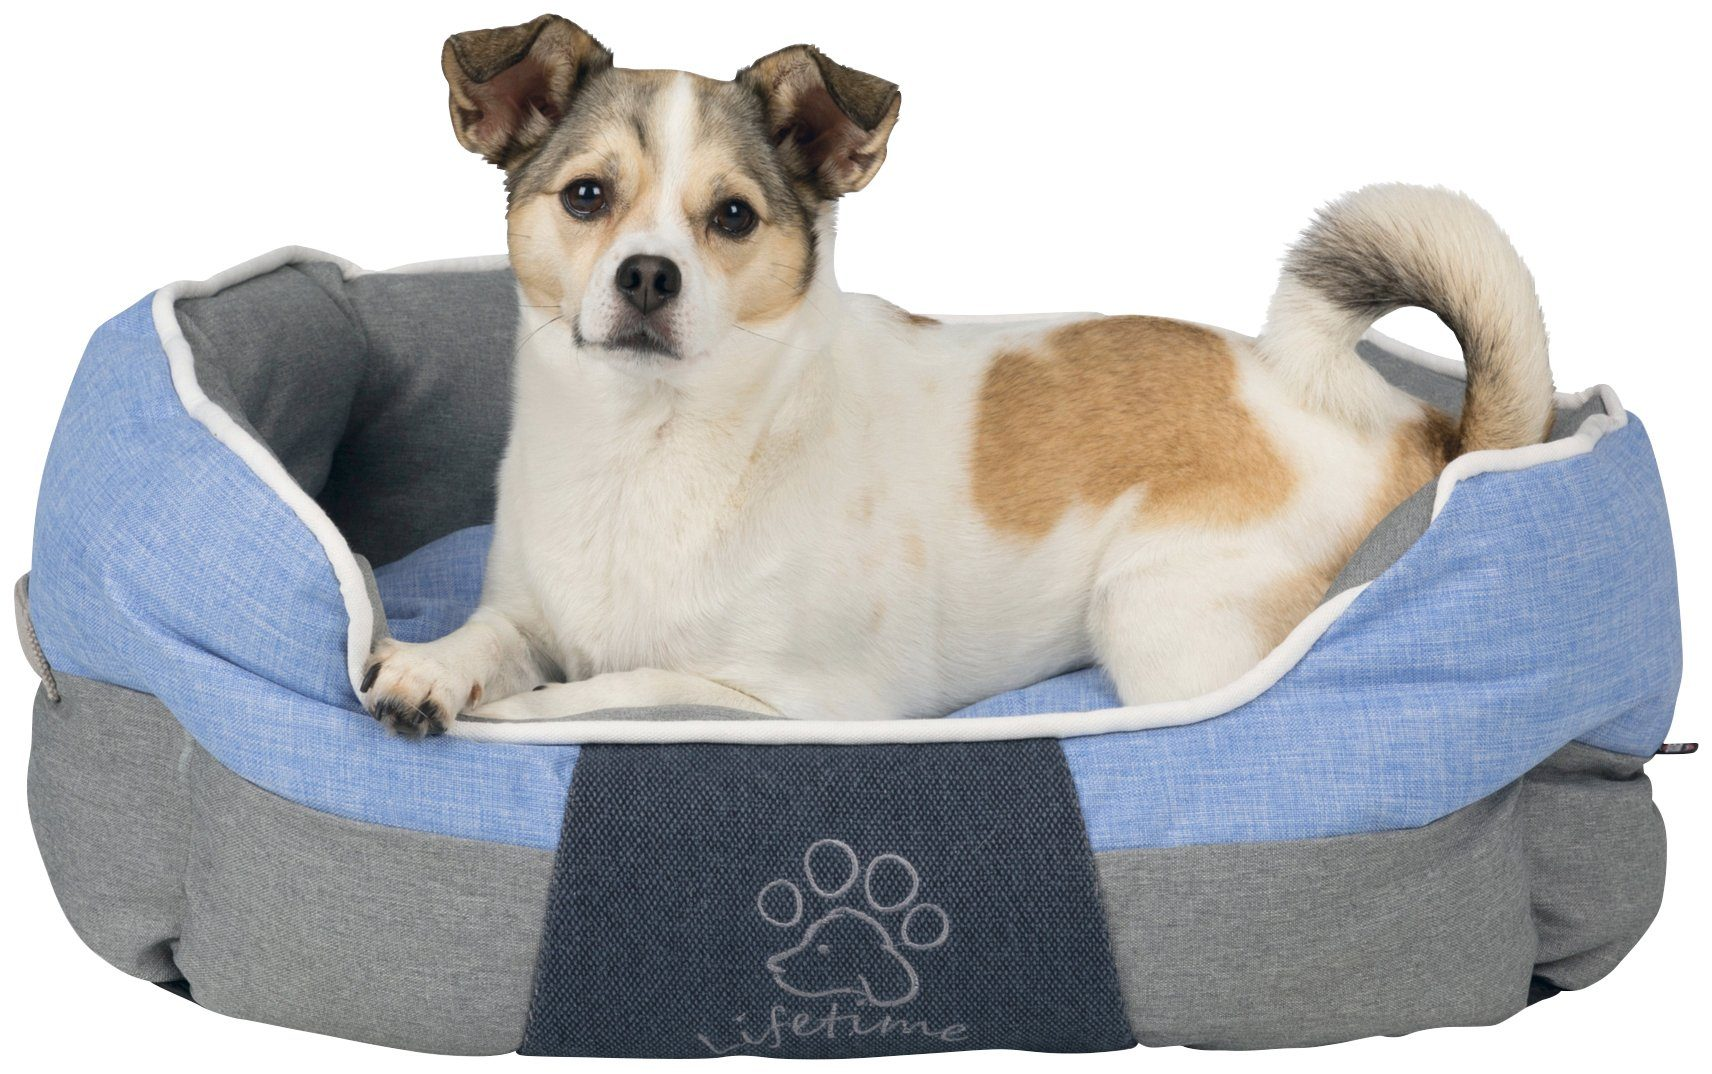 TRIXIE Hundebett und Katzenbett »Joris«, BxT: 60x50 cm, grau/blau